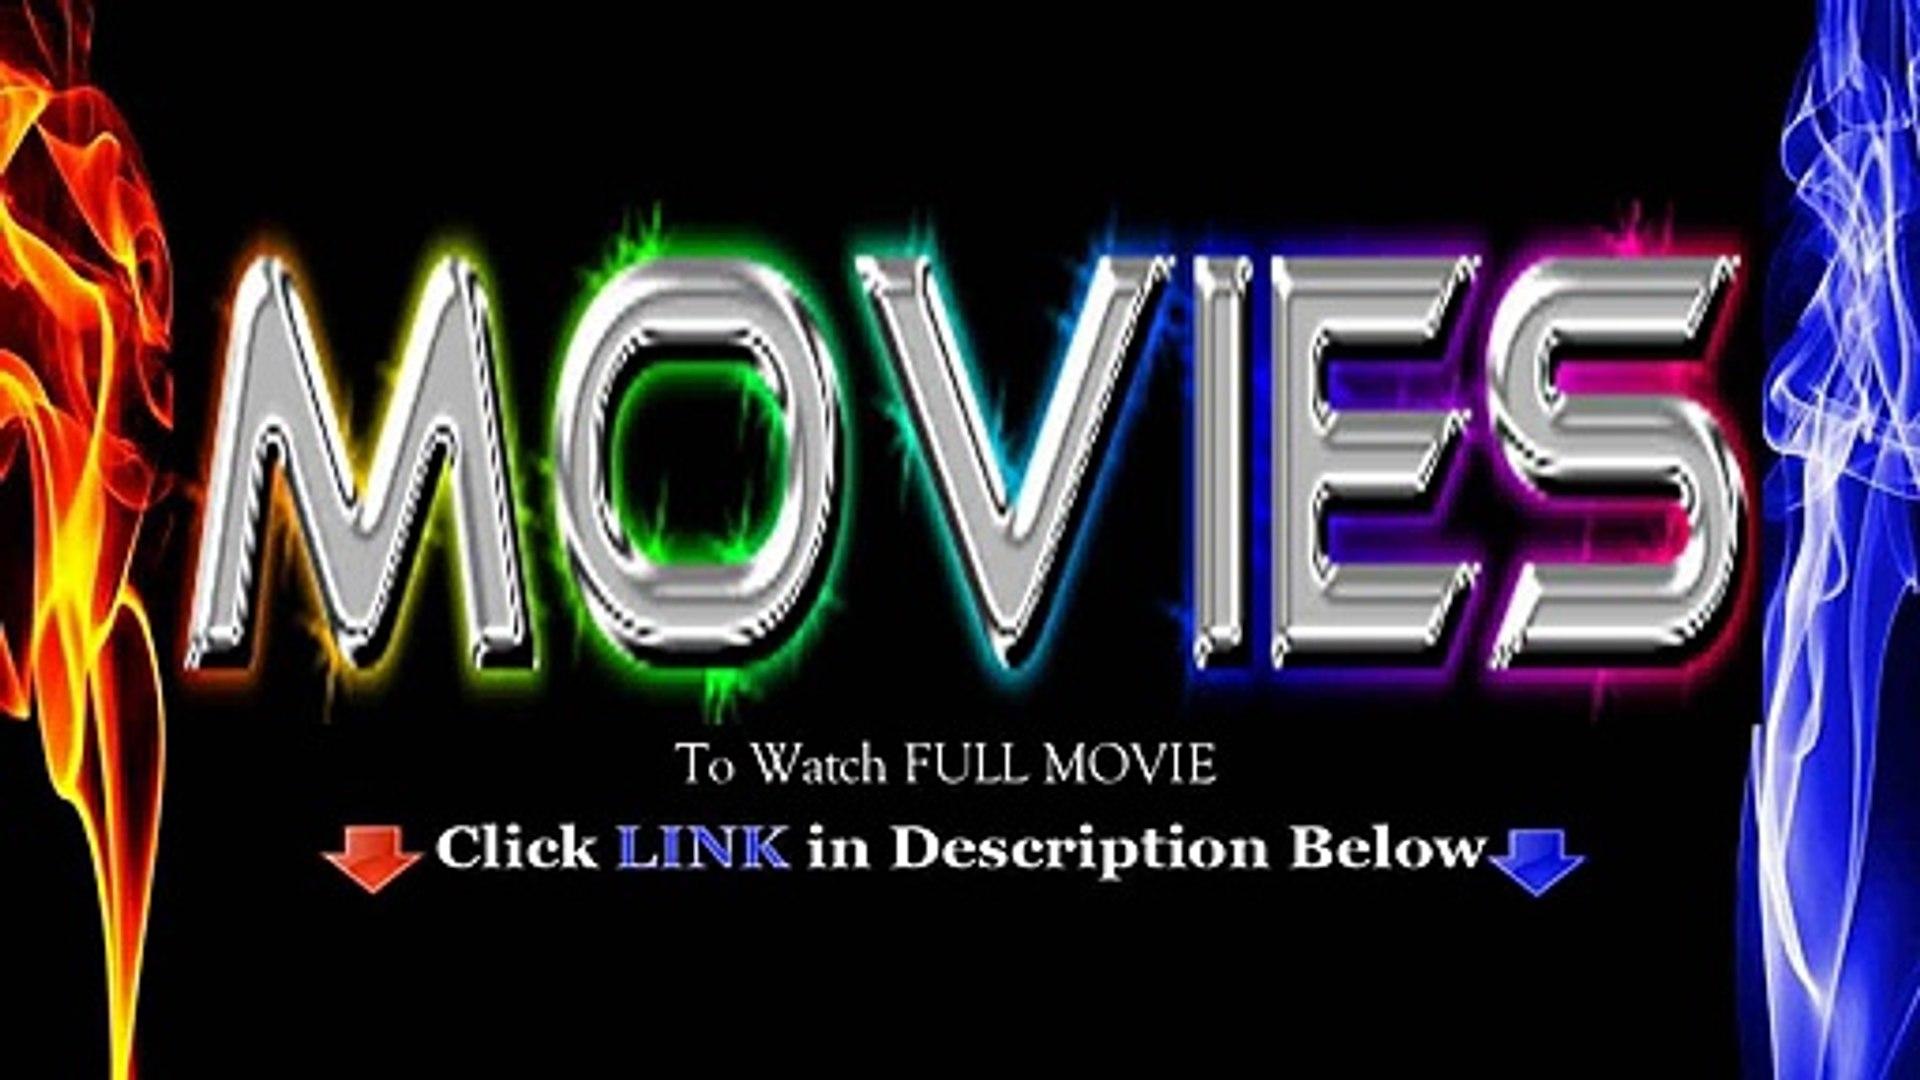 Stuart Little 2 2002 Full Movie New Dailymotion Video Dailymotion